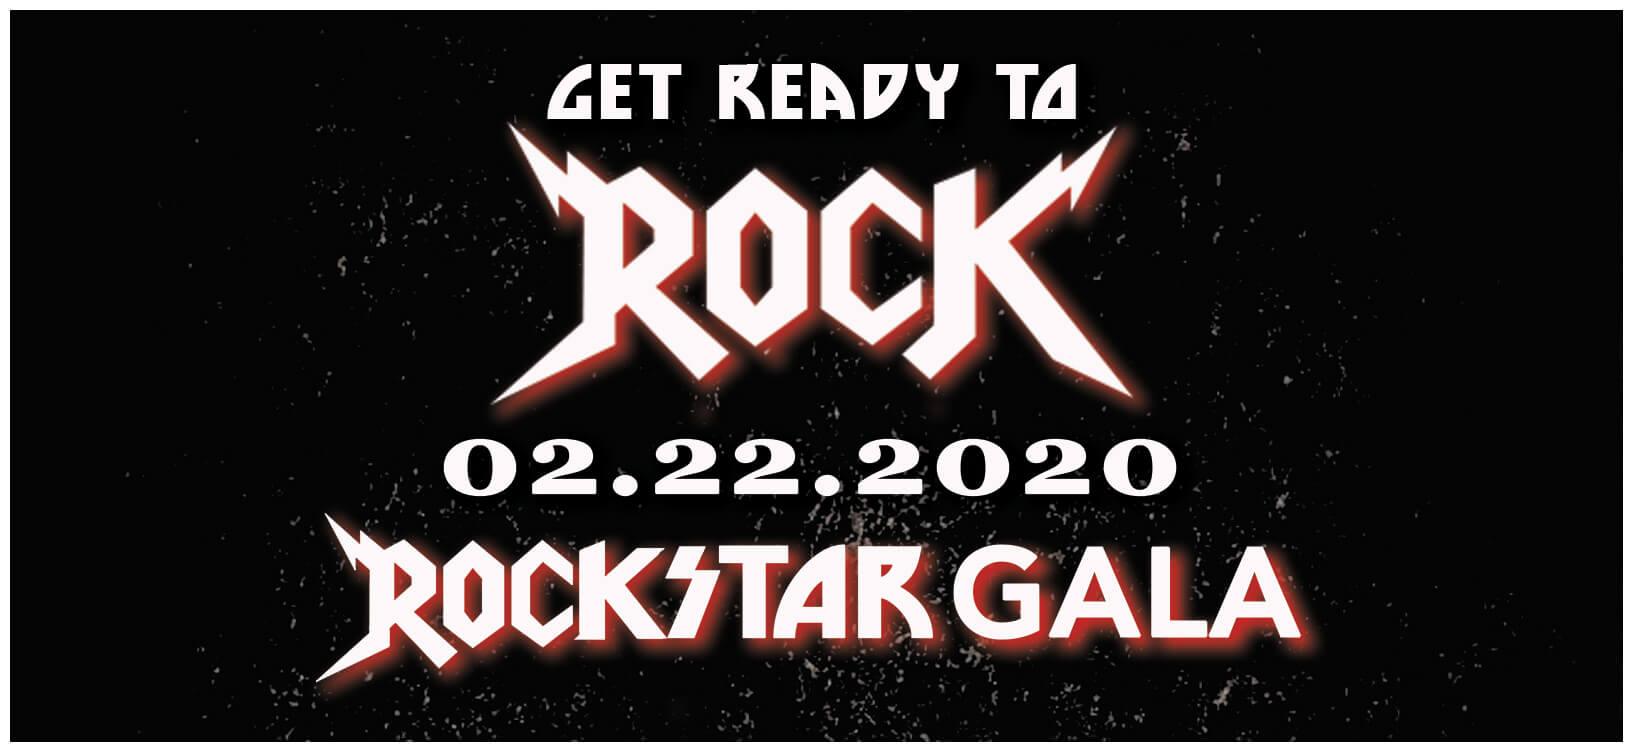 Theatre Aspen Rockstar Gala 2020